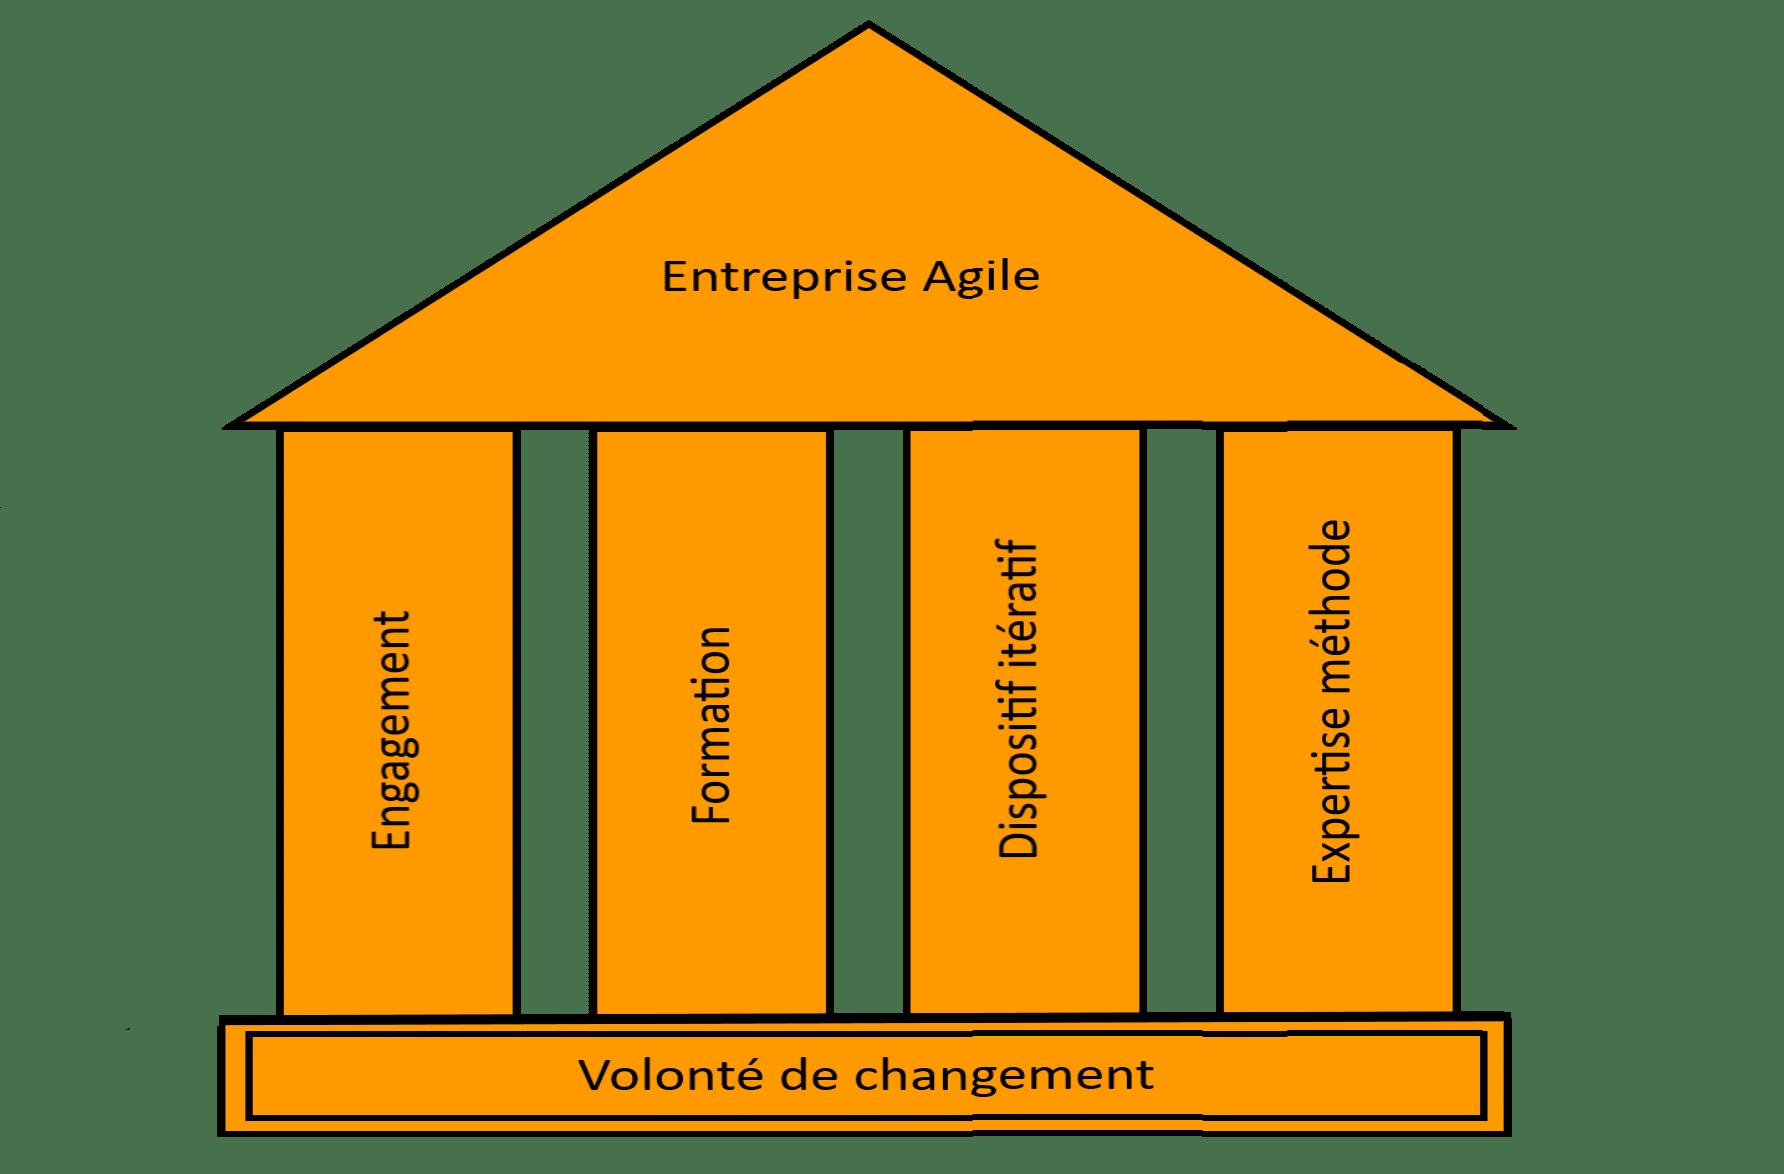 maison de lagilite V0.2 1